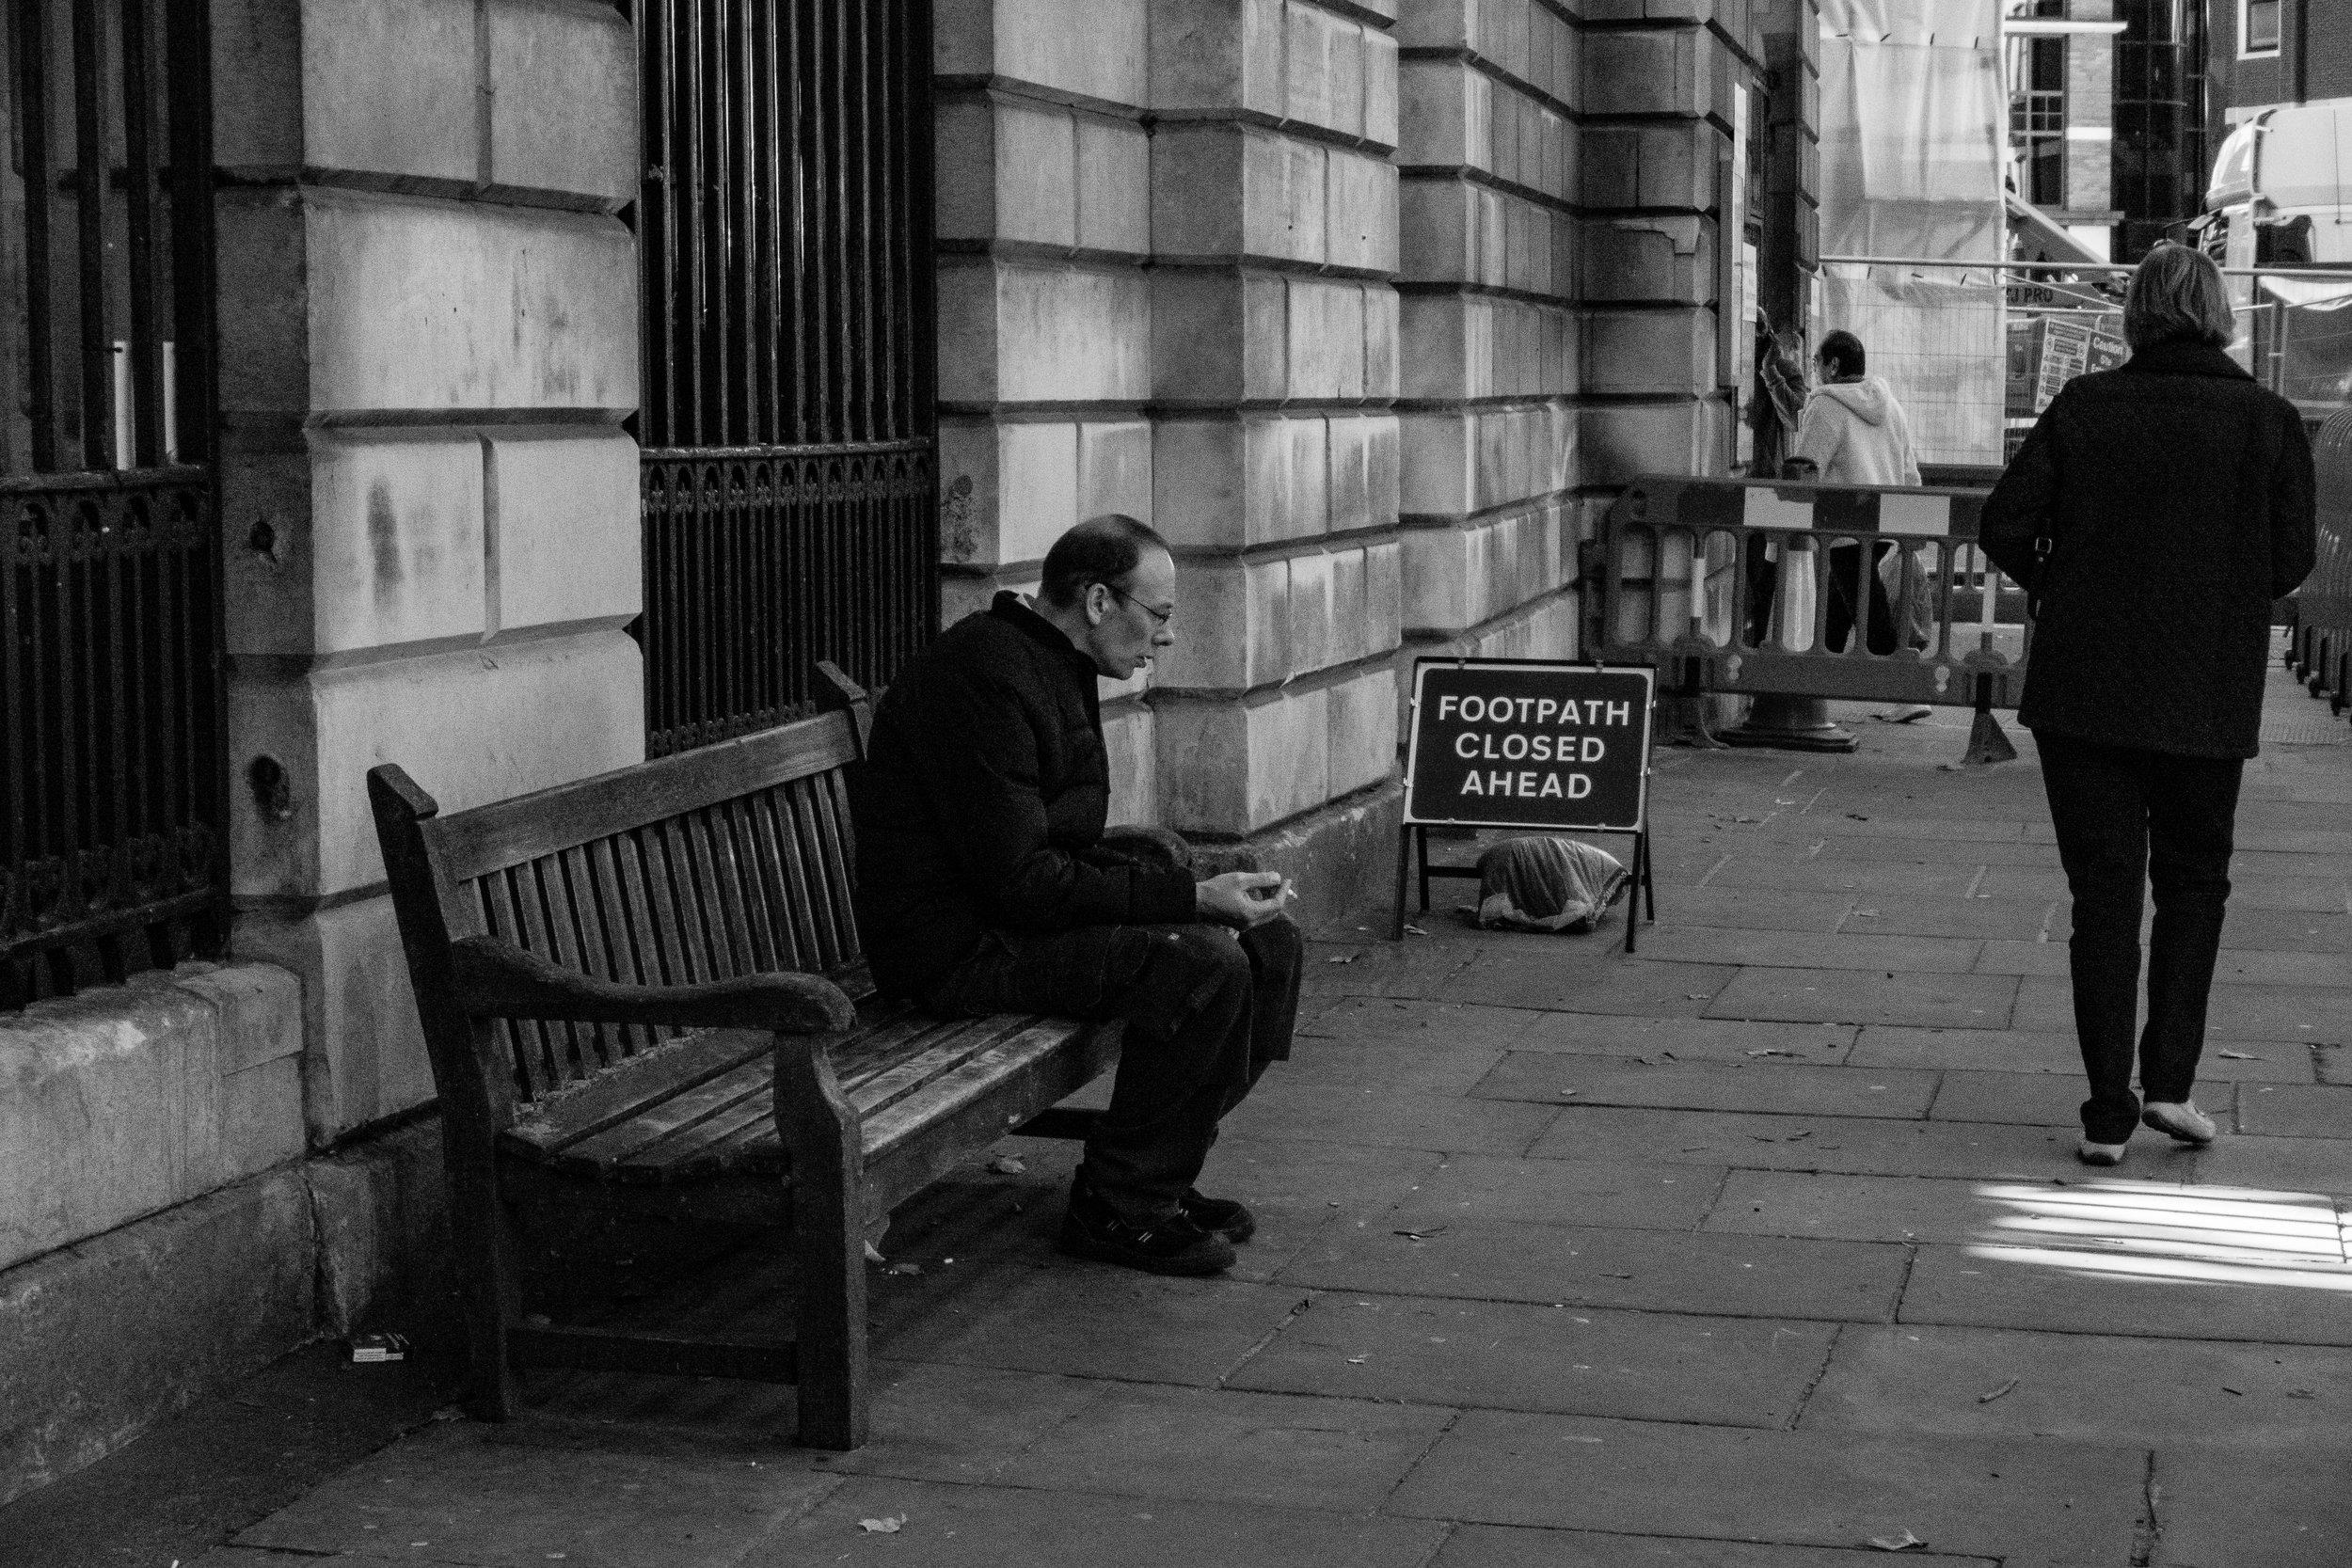 street_london_2018 (7 of 19).jpg